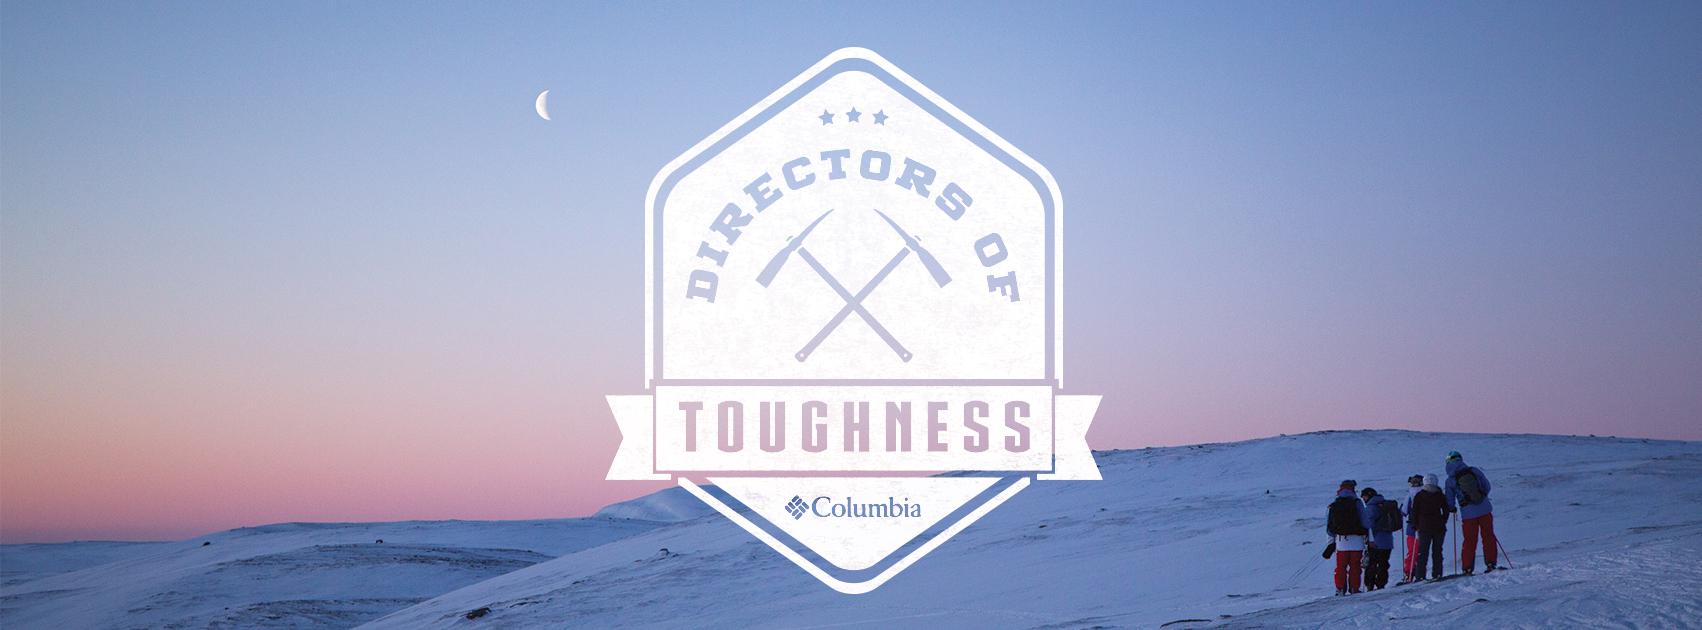 Columbia Sportswear- Directors of Tougness